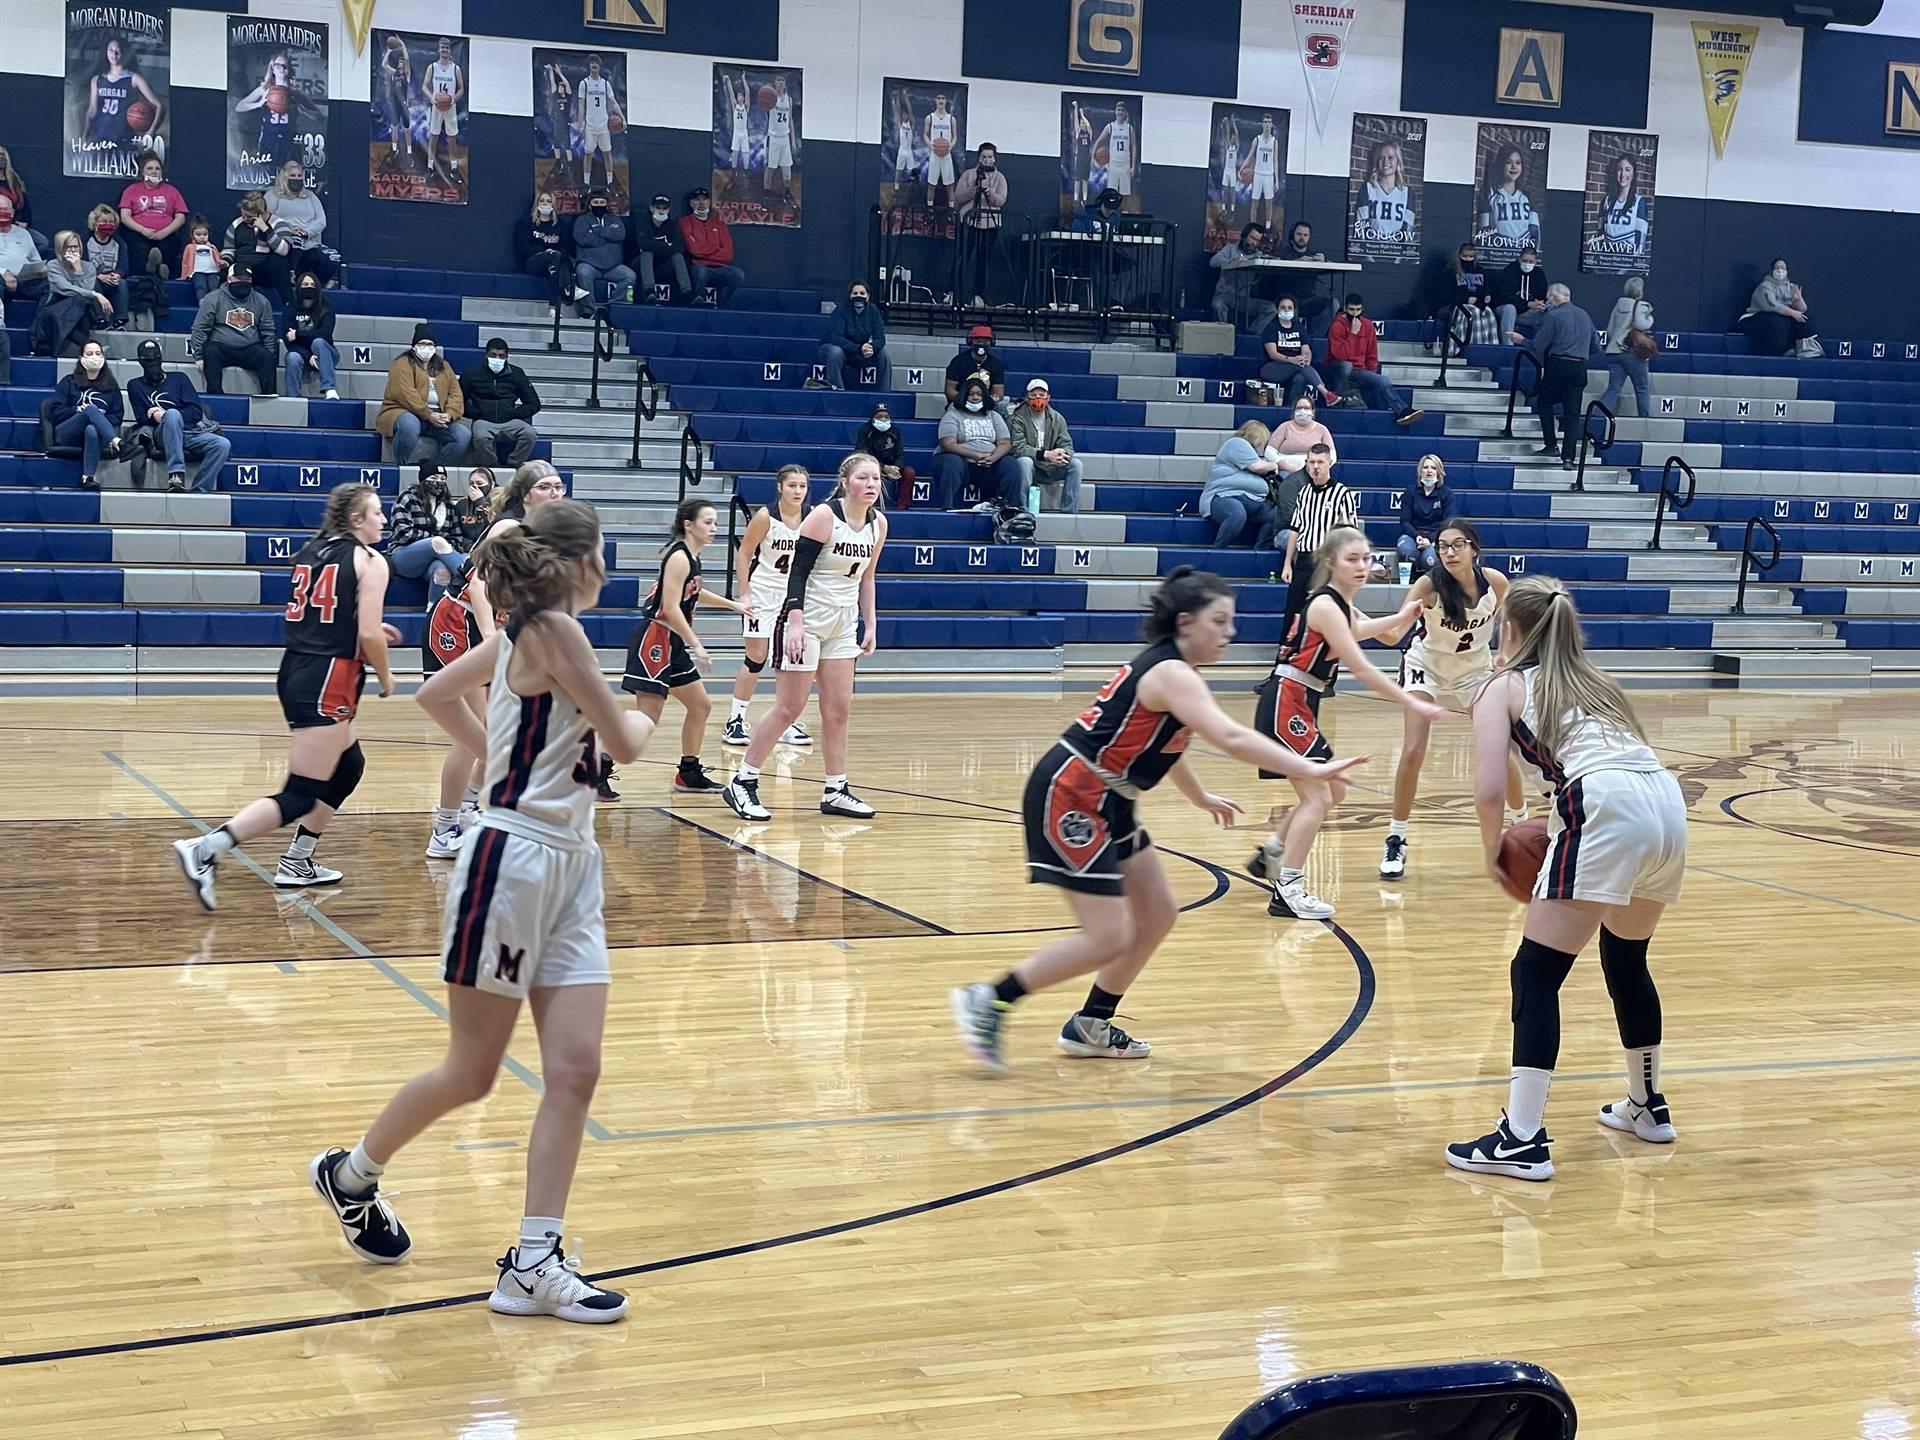 JV Girls Basketball taking on Morgan